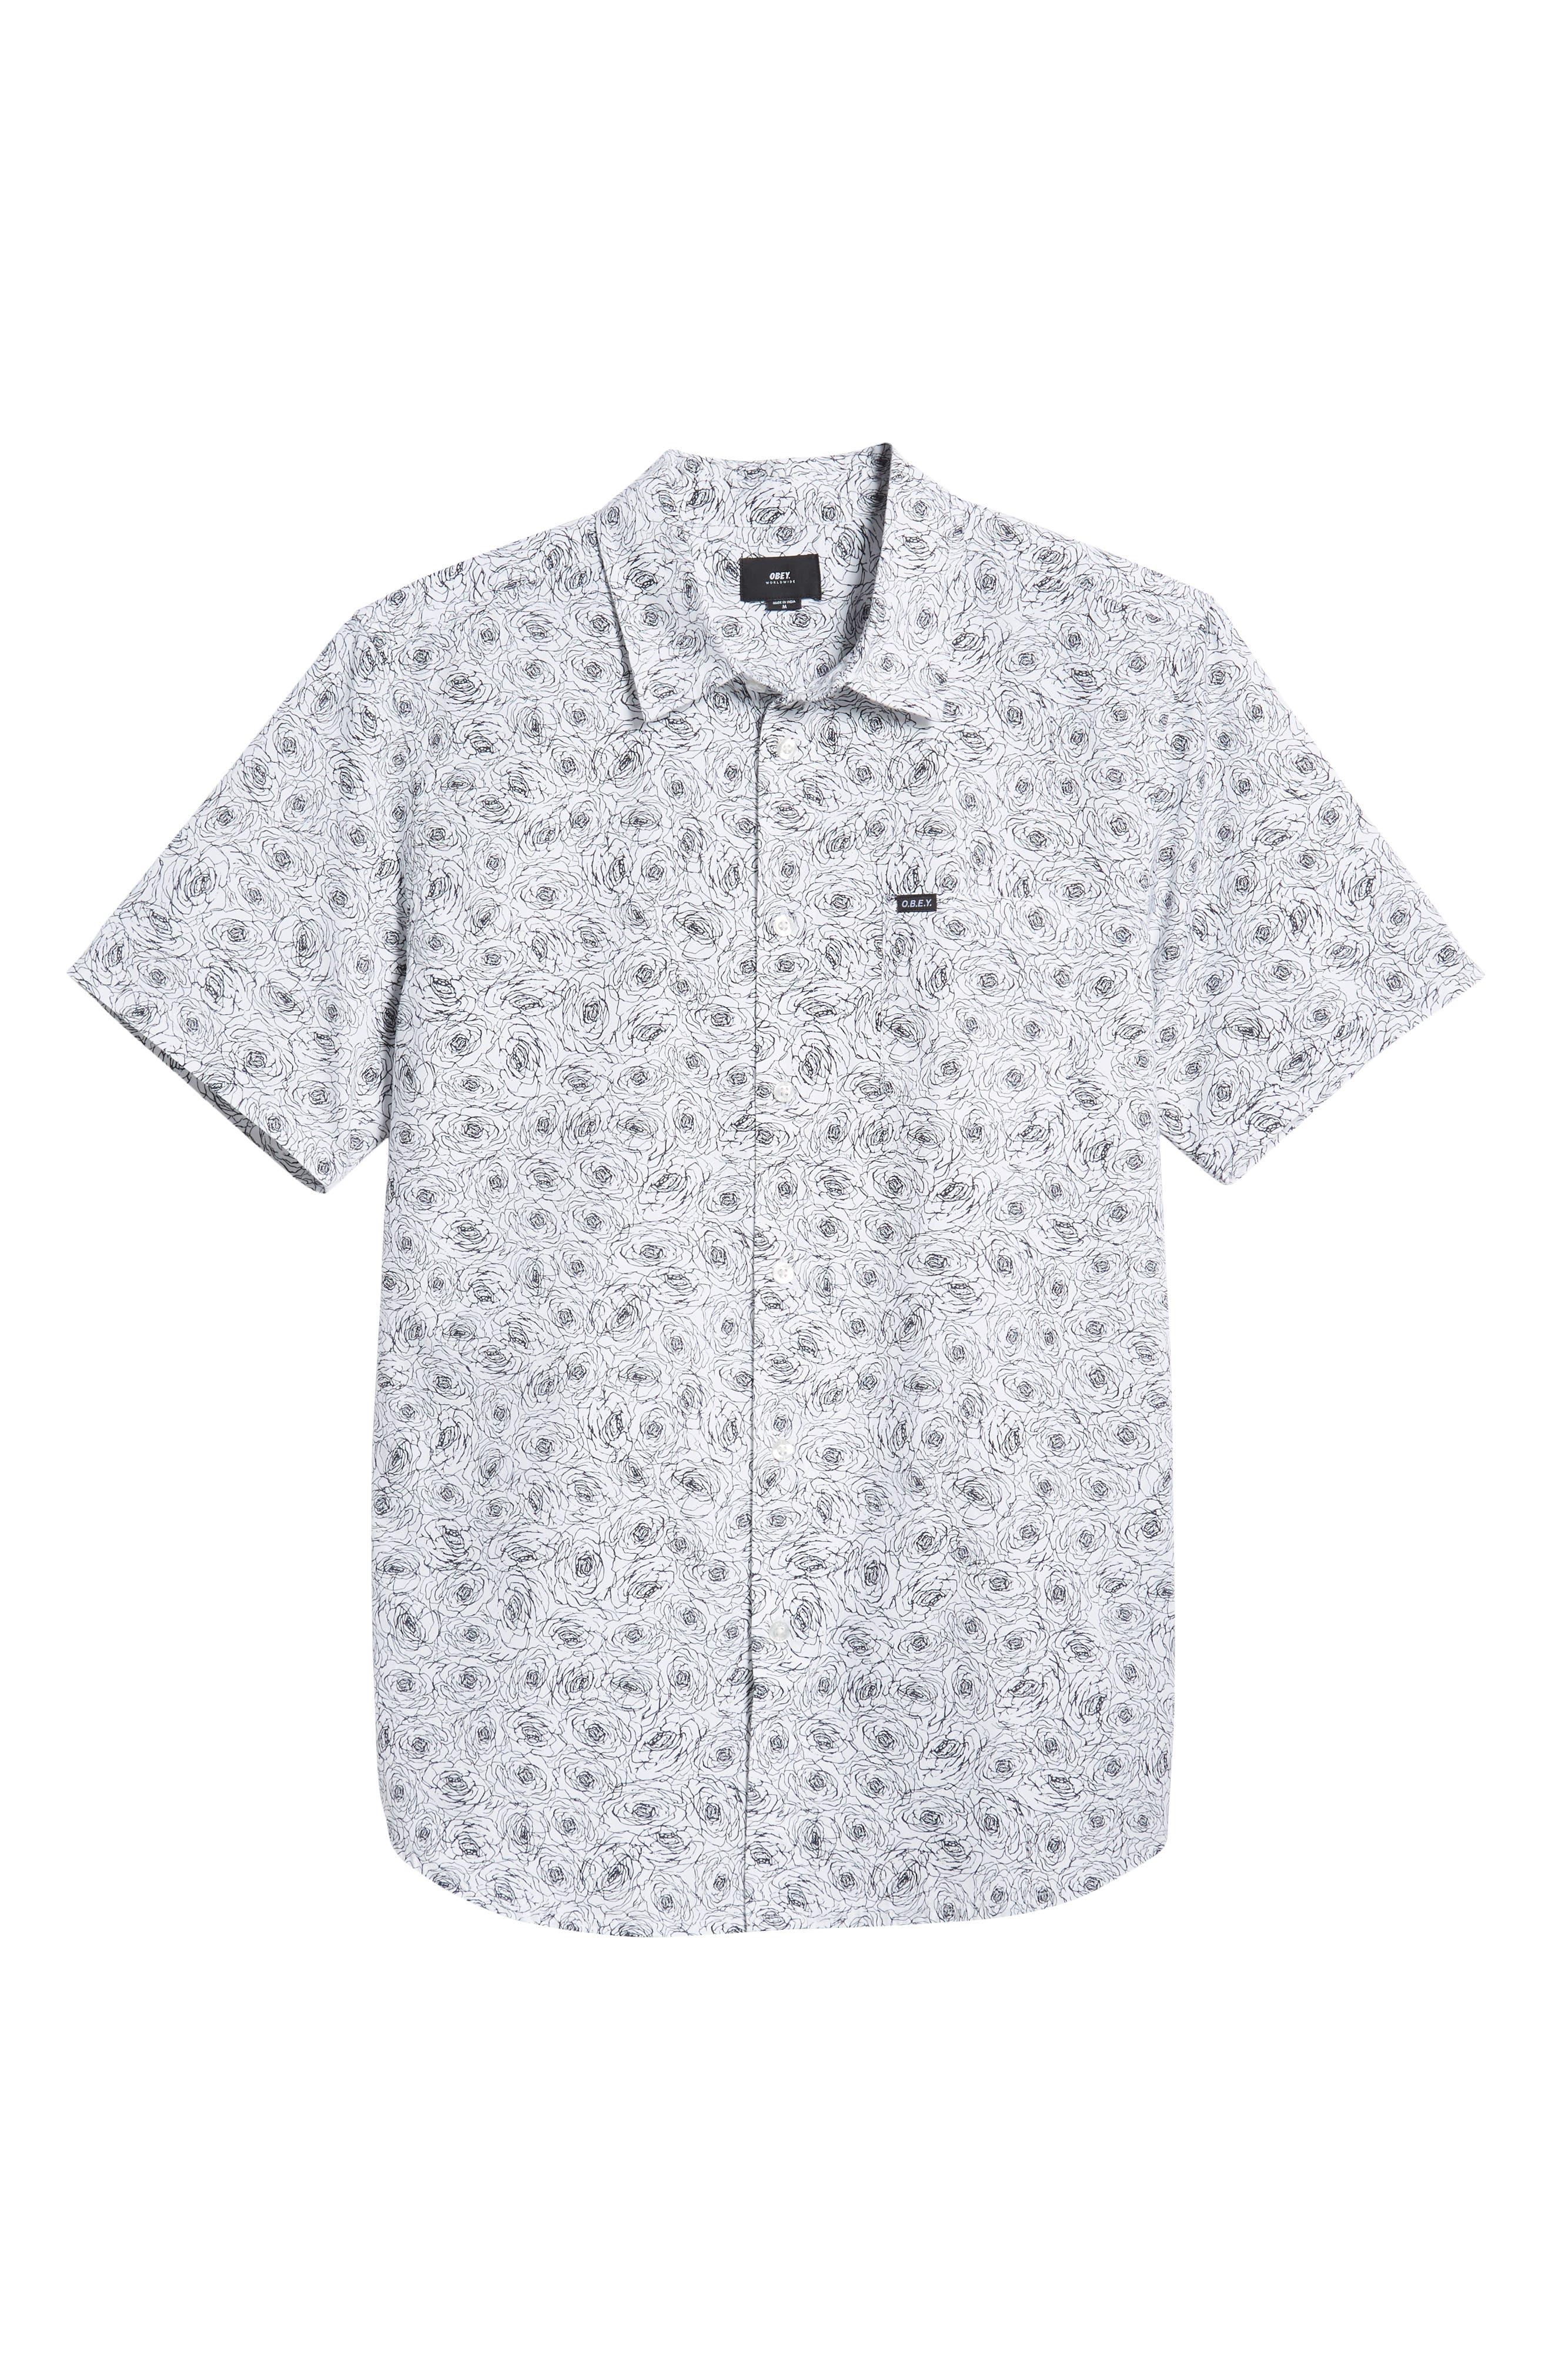 Rosie Print Woven Shirt,                             Alternate thumbnail 5, color,                             WHITE MULTI